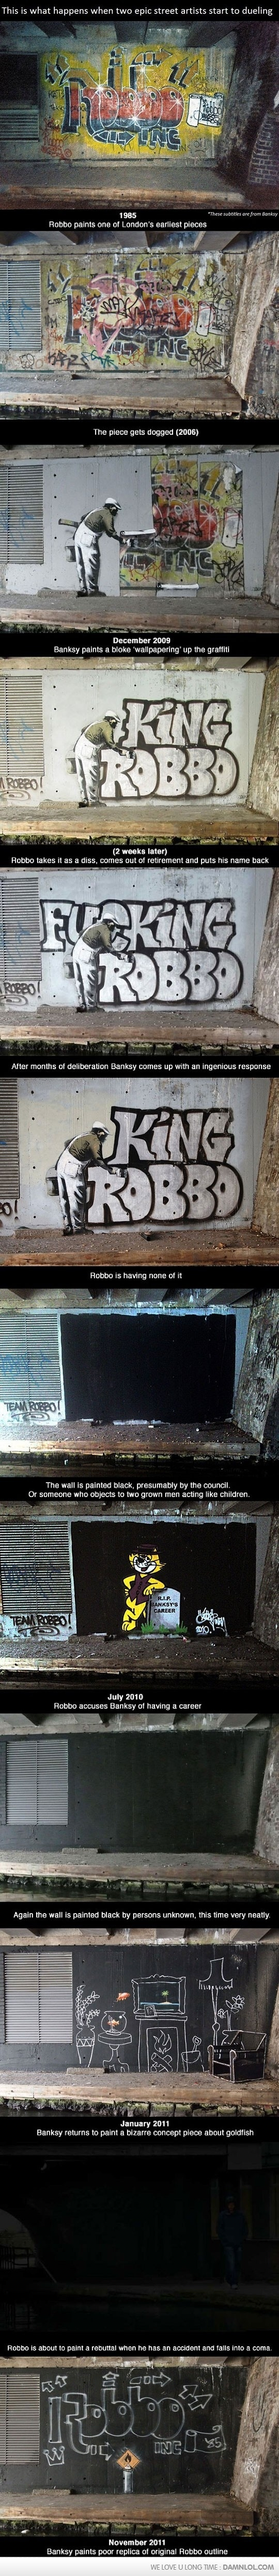 Faith In Humanity Restored. Robbo vs. Banksy.